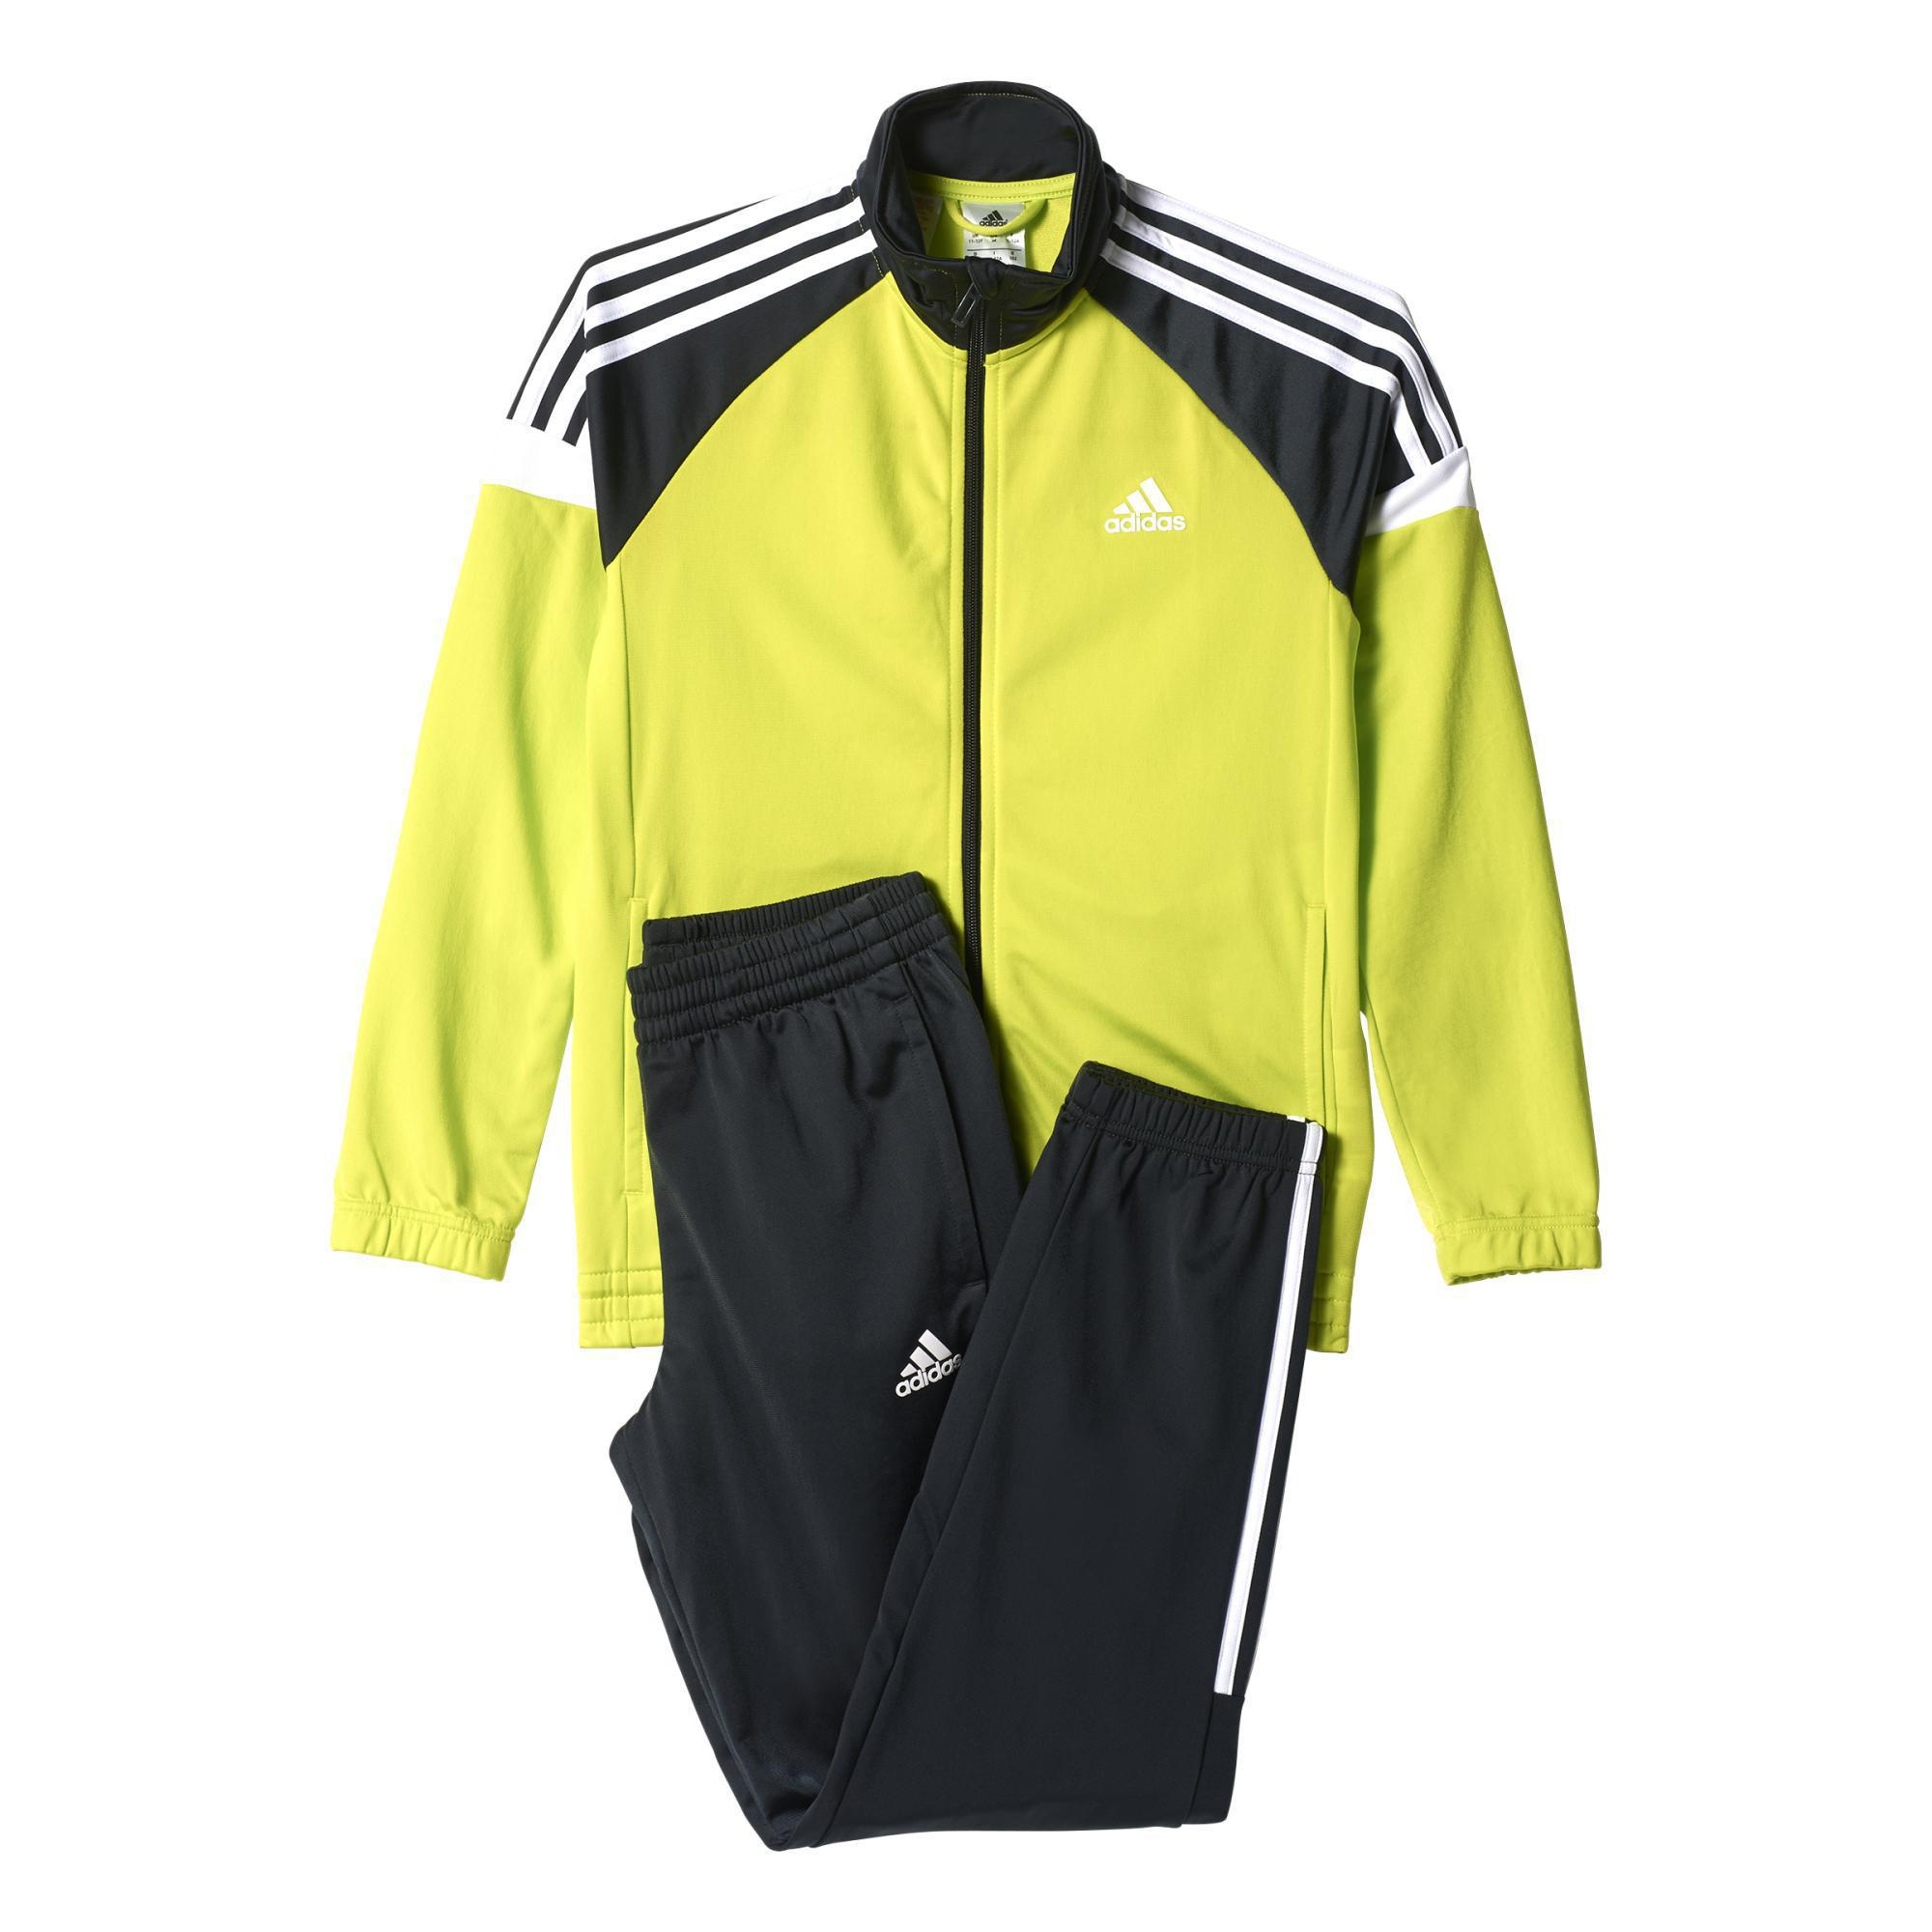 9761d19e9d88 Adidas Boys Tiberio Tracksuit - Yellow Black - Tennisnuts.com